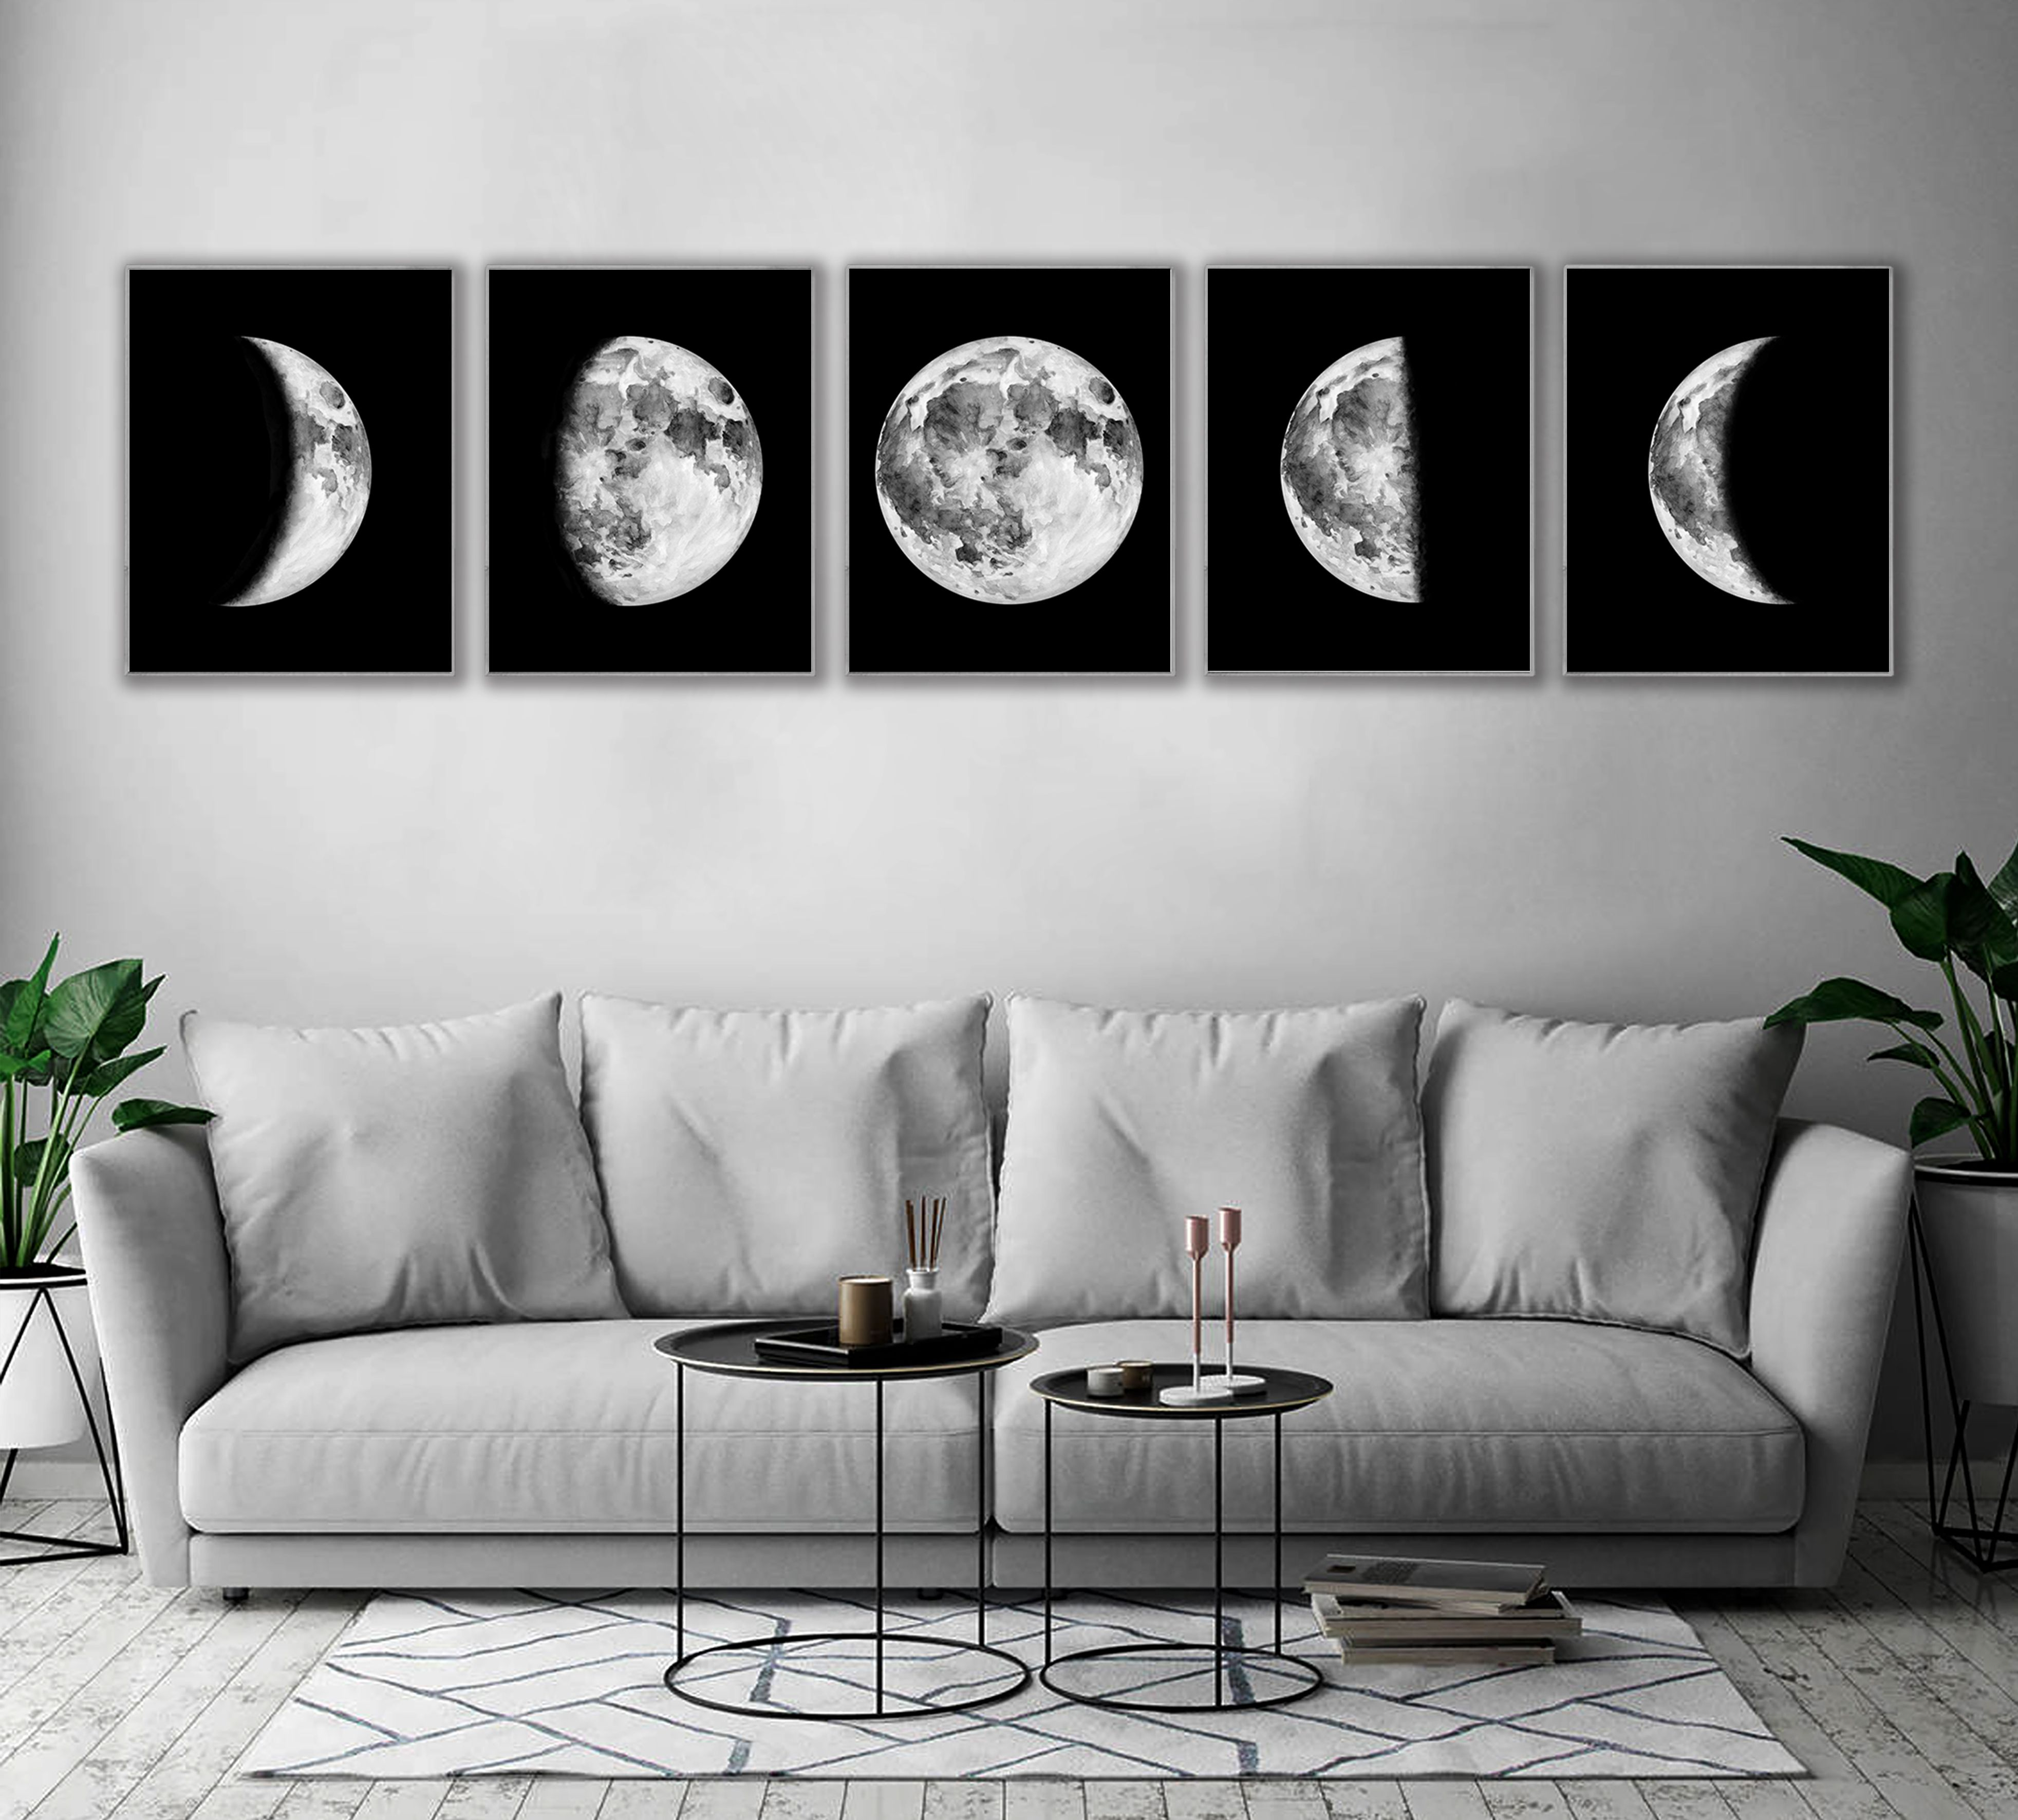 Large Wall Art Digital Download Art Moon Decor Space Art Etsy Wall Decor Bedroom Wall Decor Living Room White Wall Decor